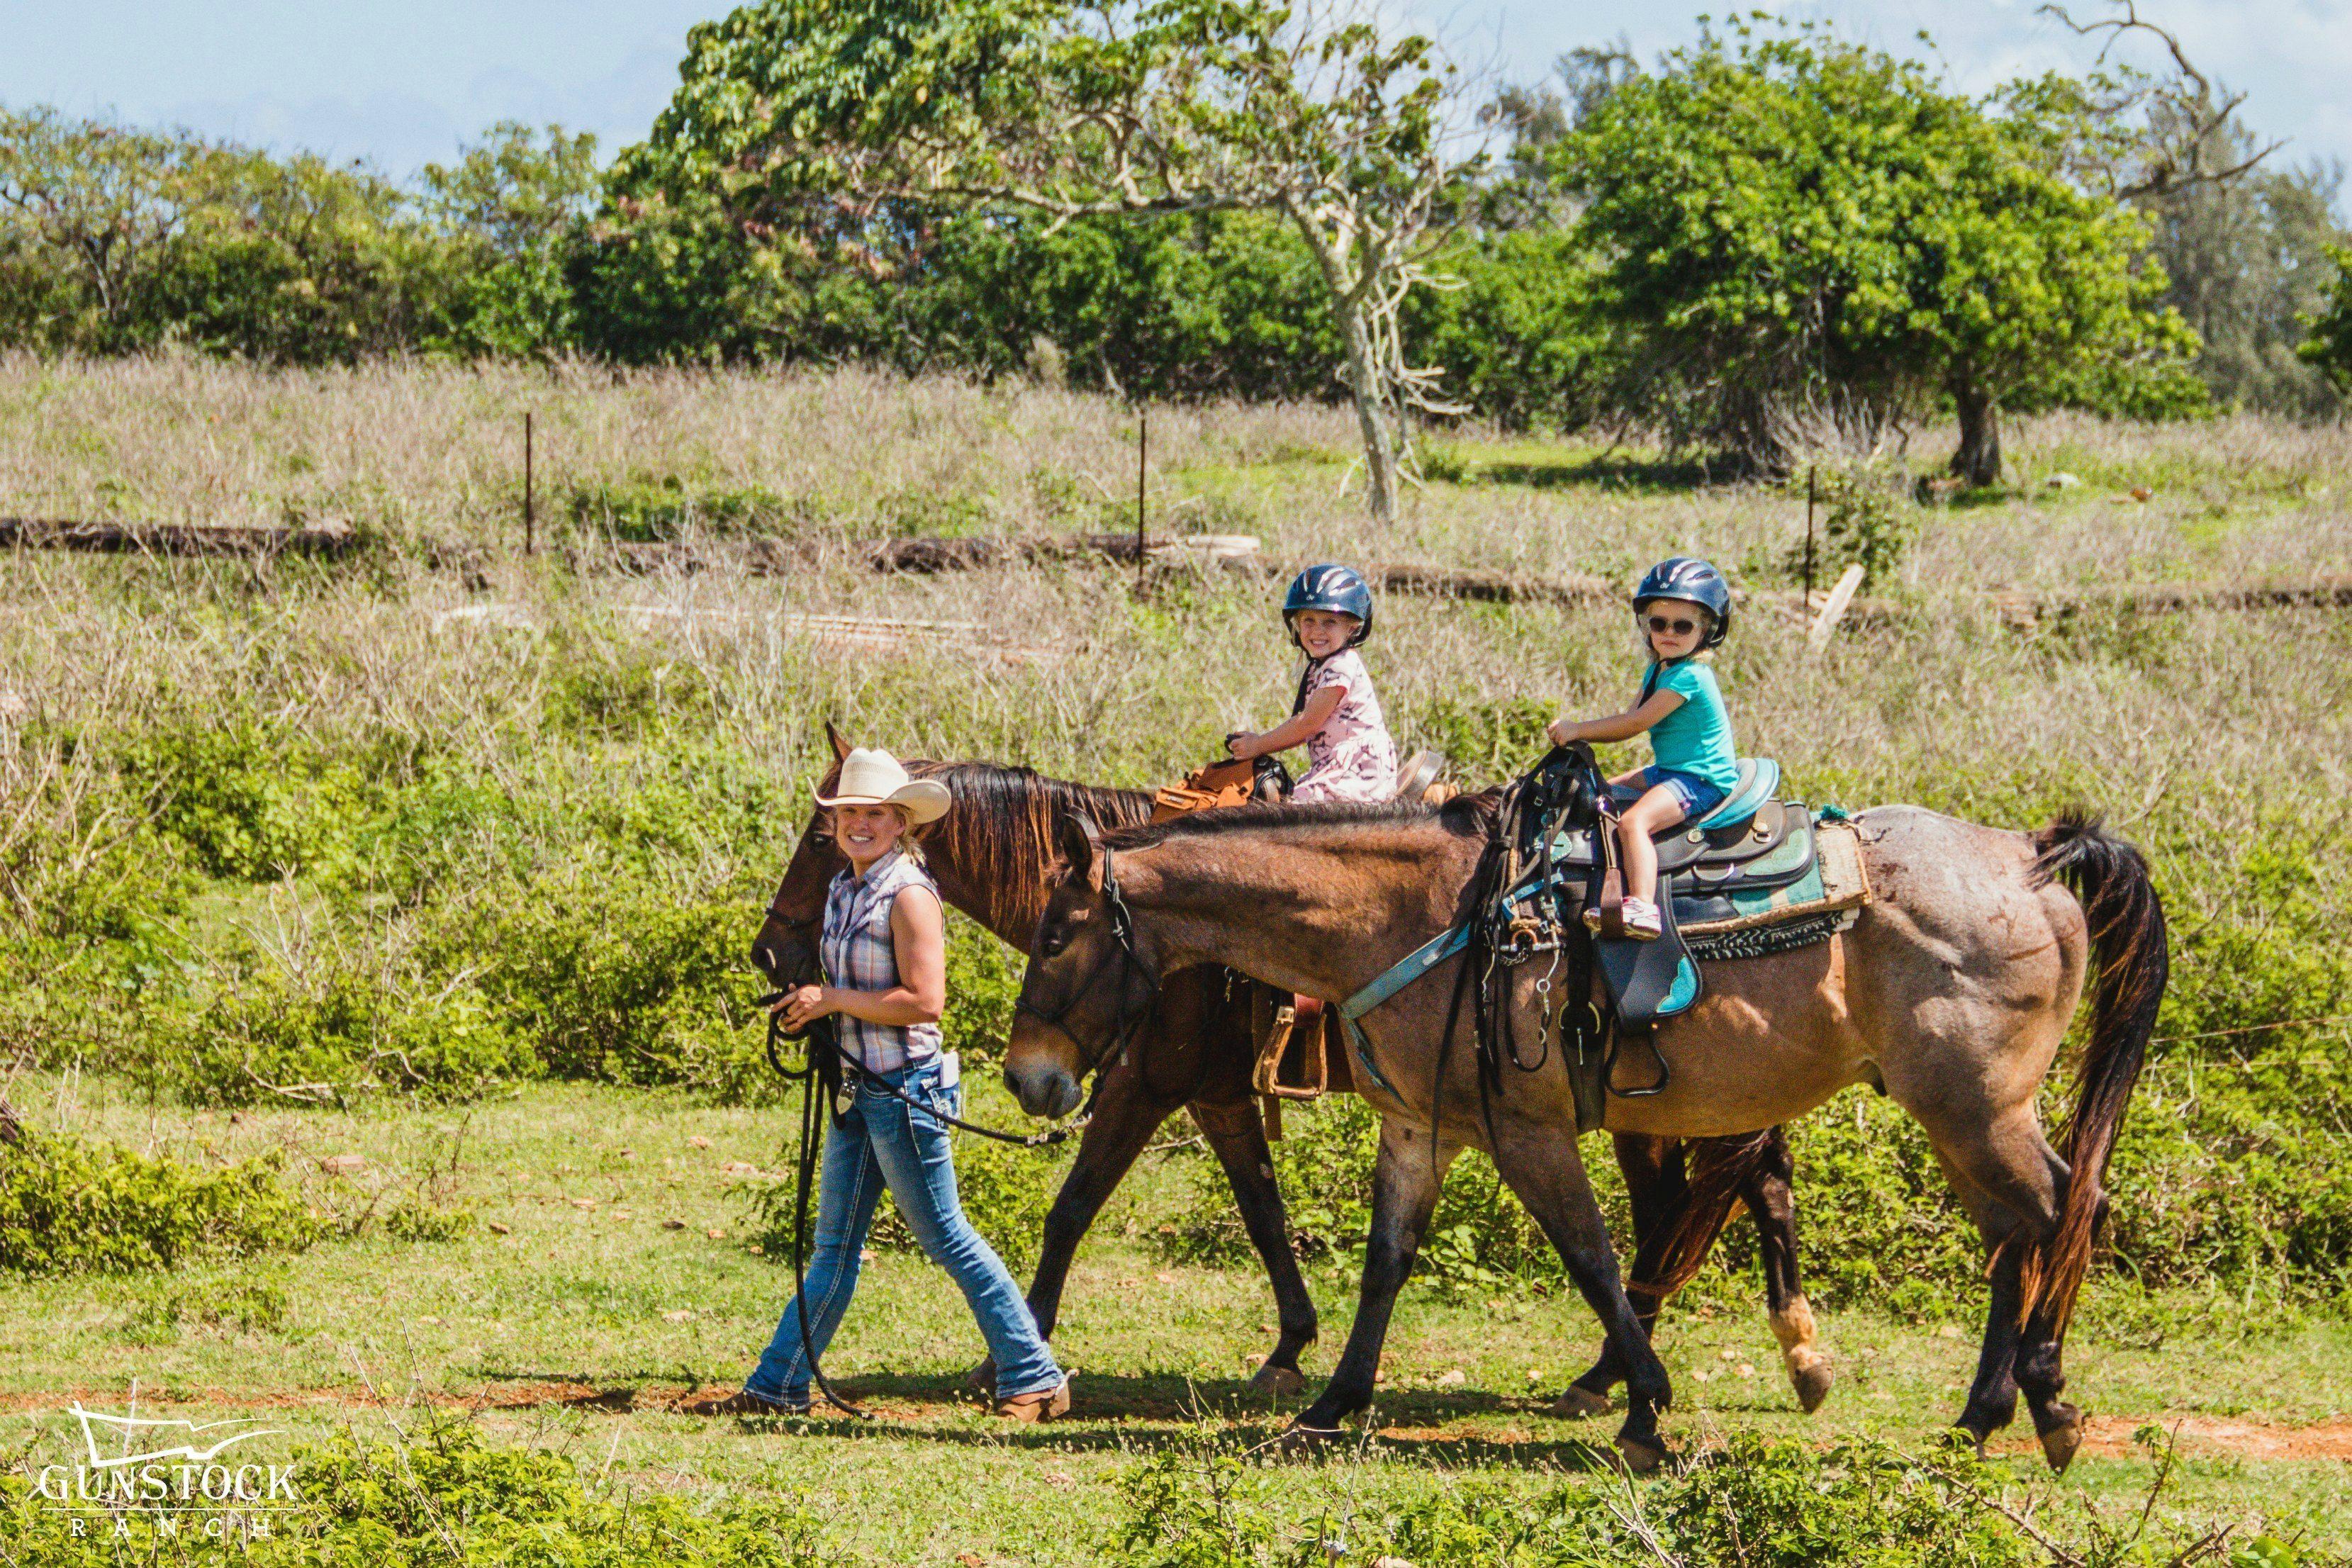 Woman leads two children on horseback